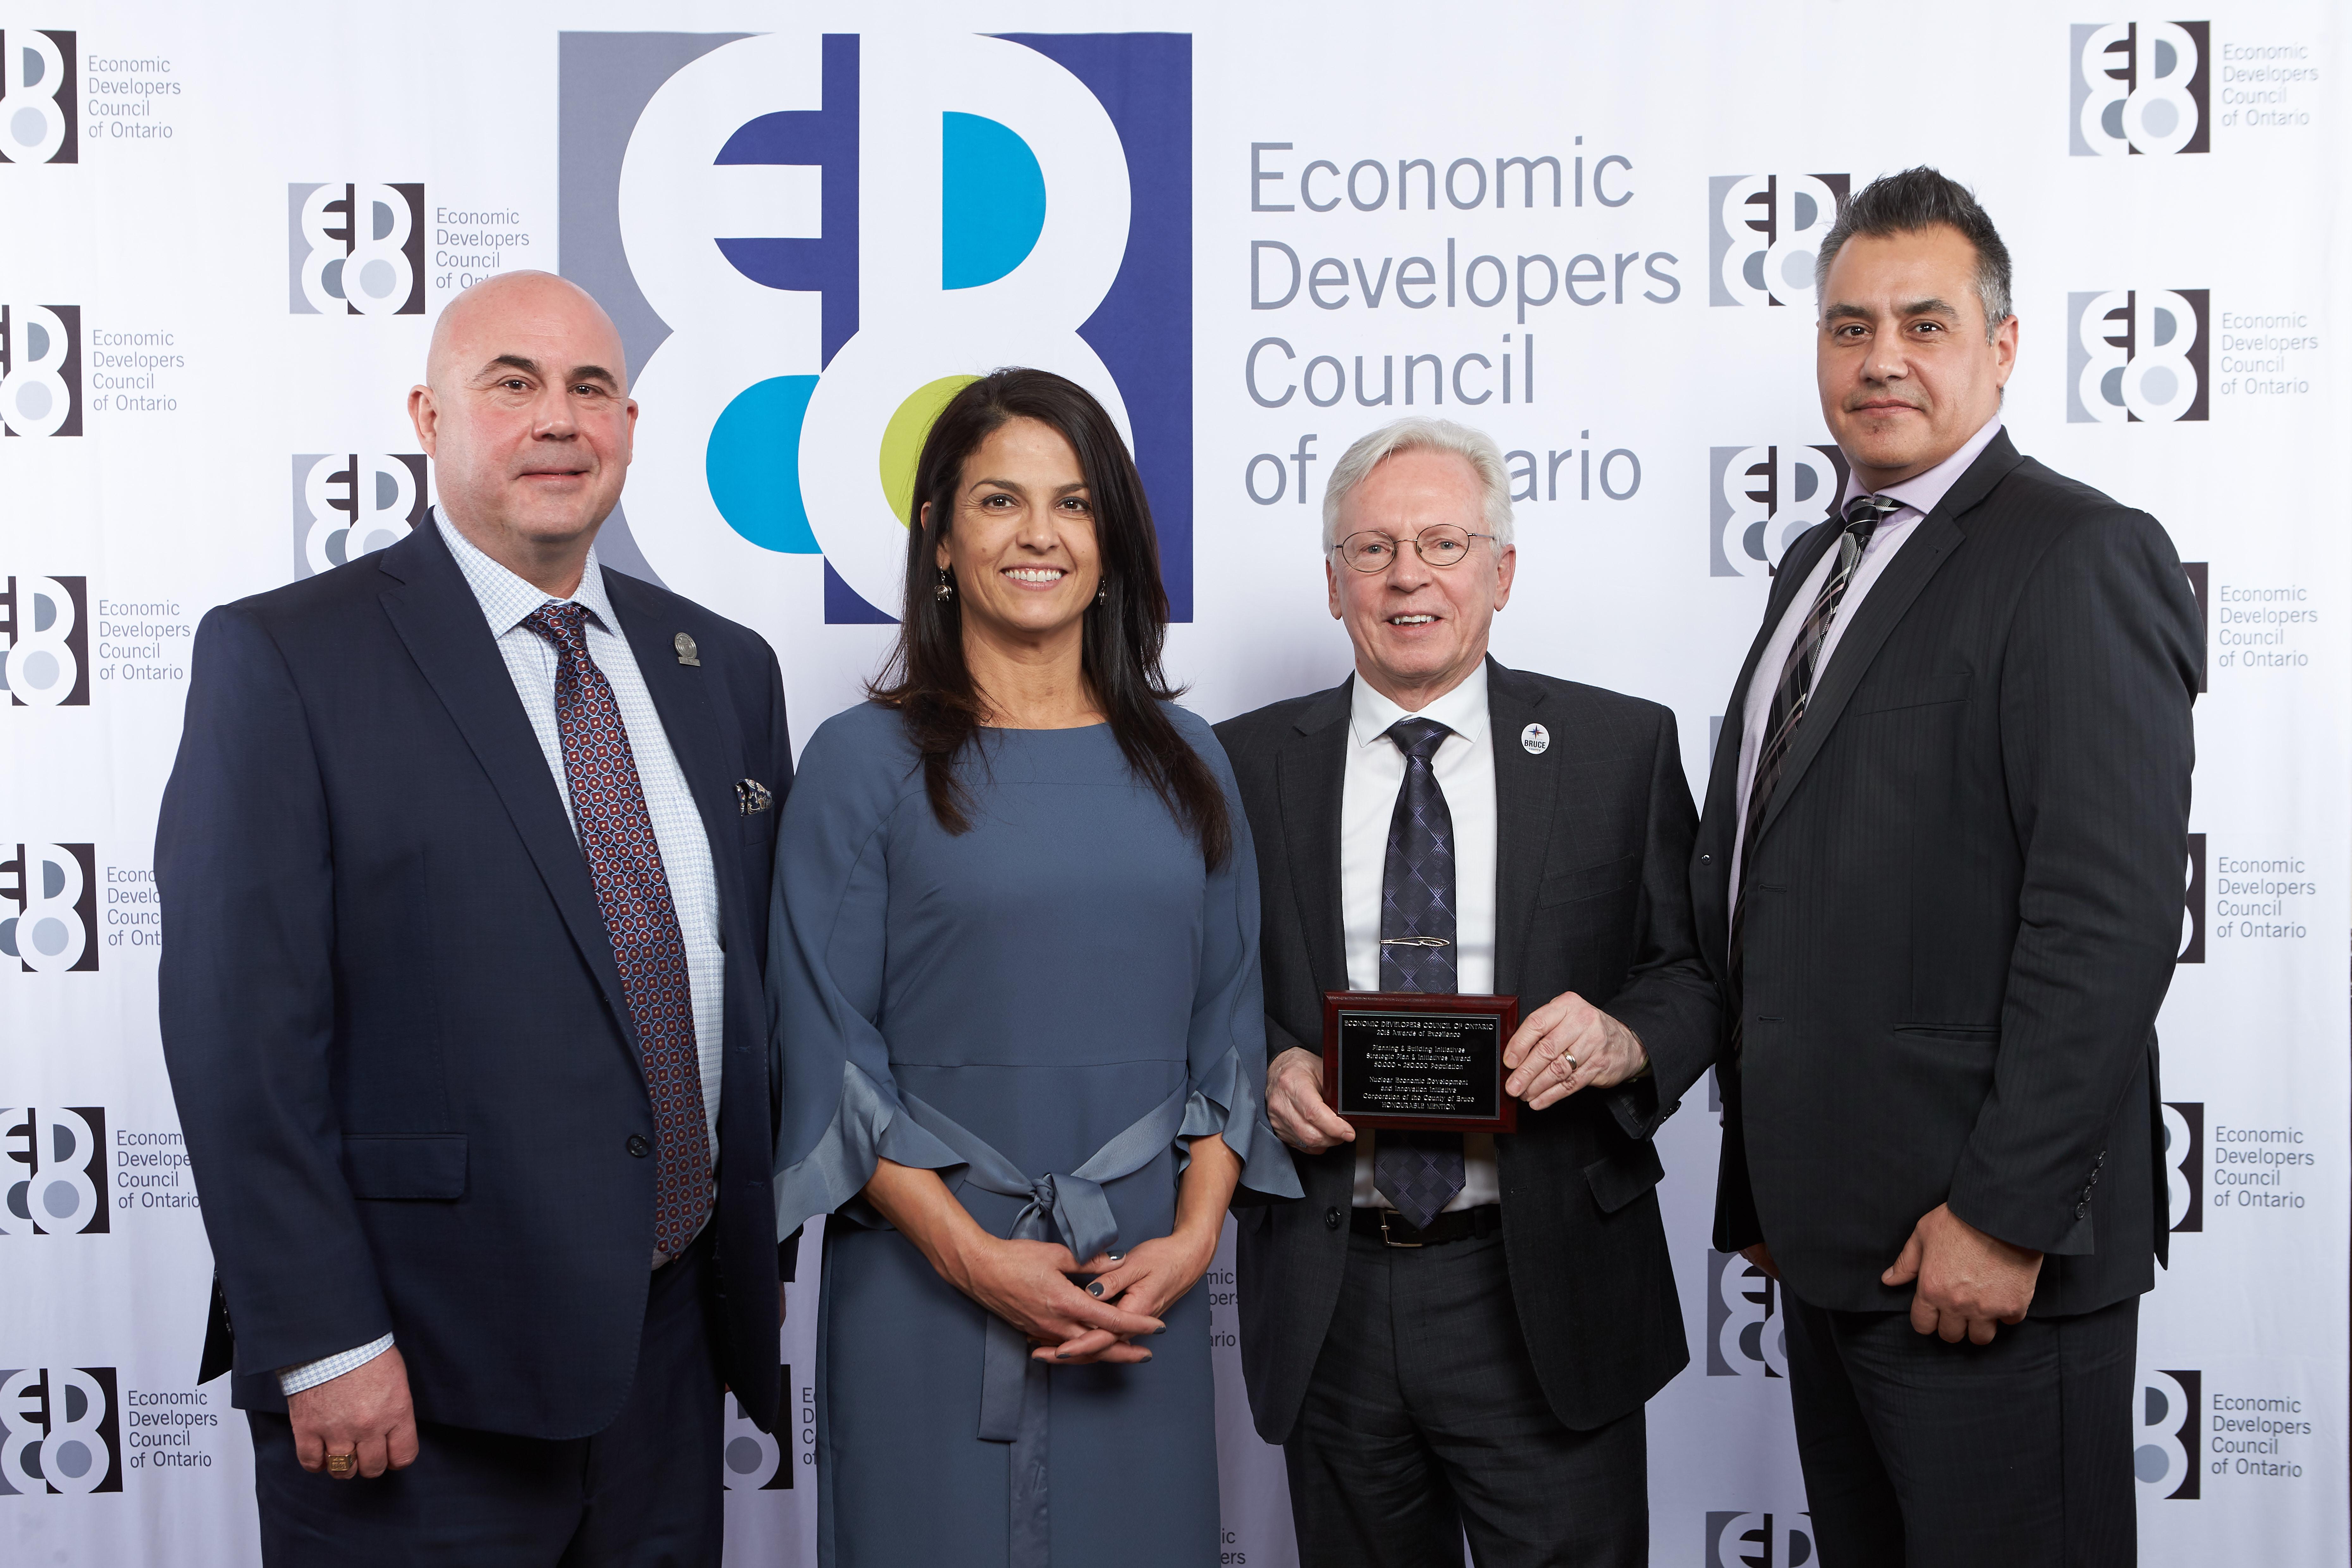 Economic Development Council Ontario EDCO Conference 2019